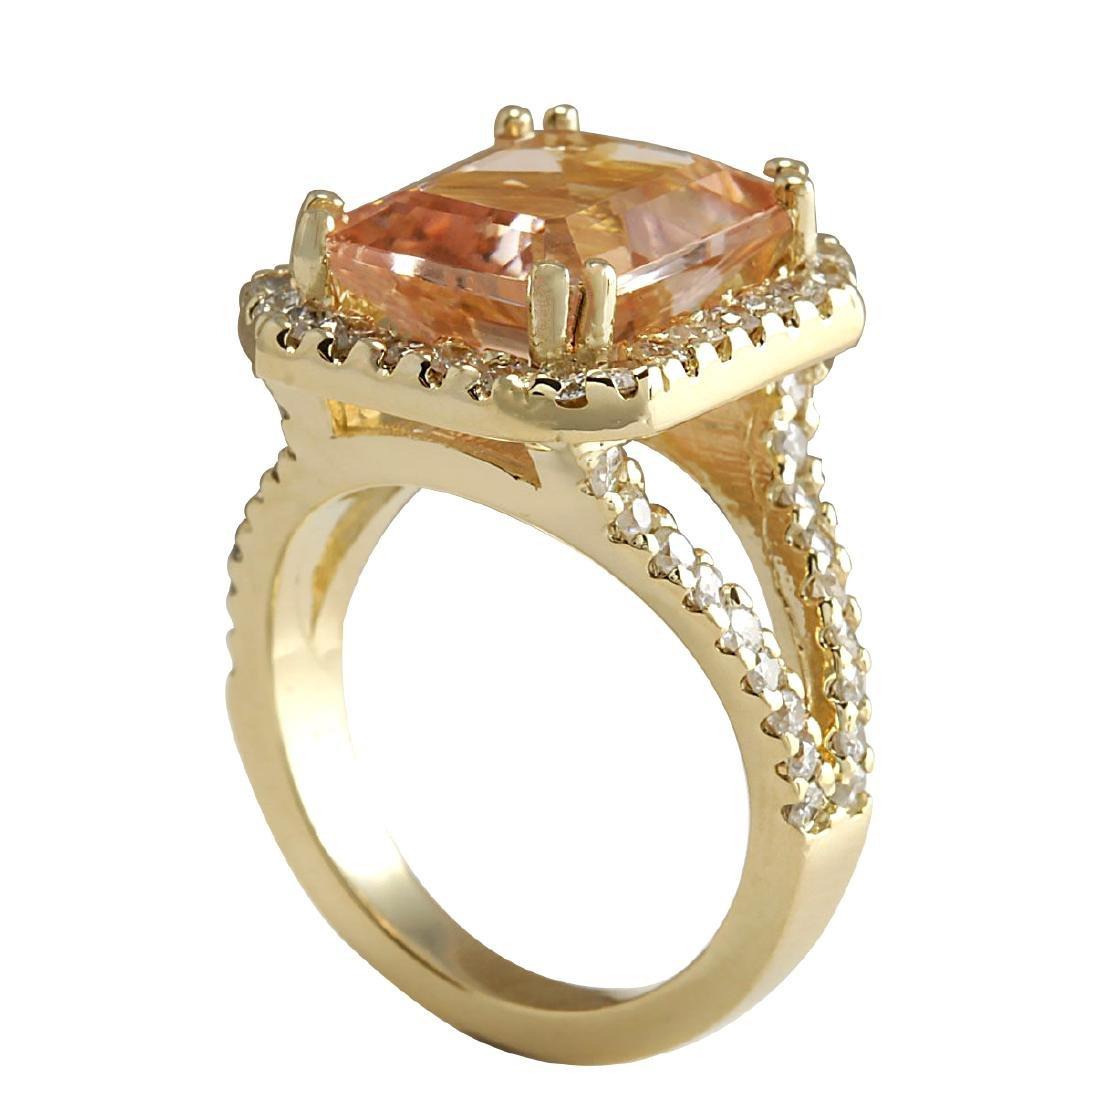 6.92CTW Natural Peach Morganite And Diamond Ring In 18K - 3